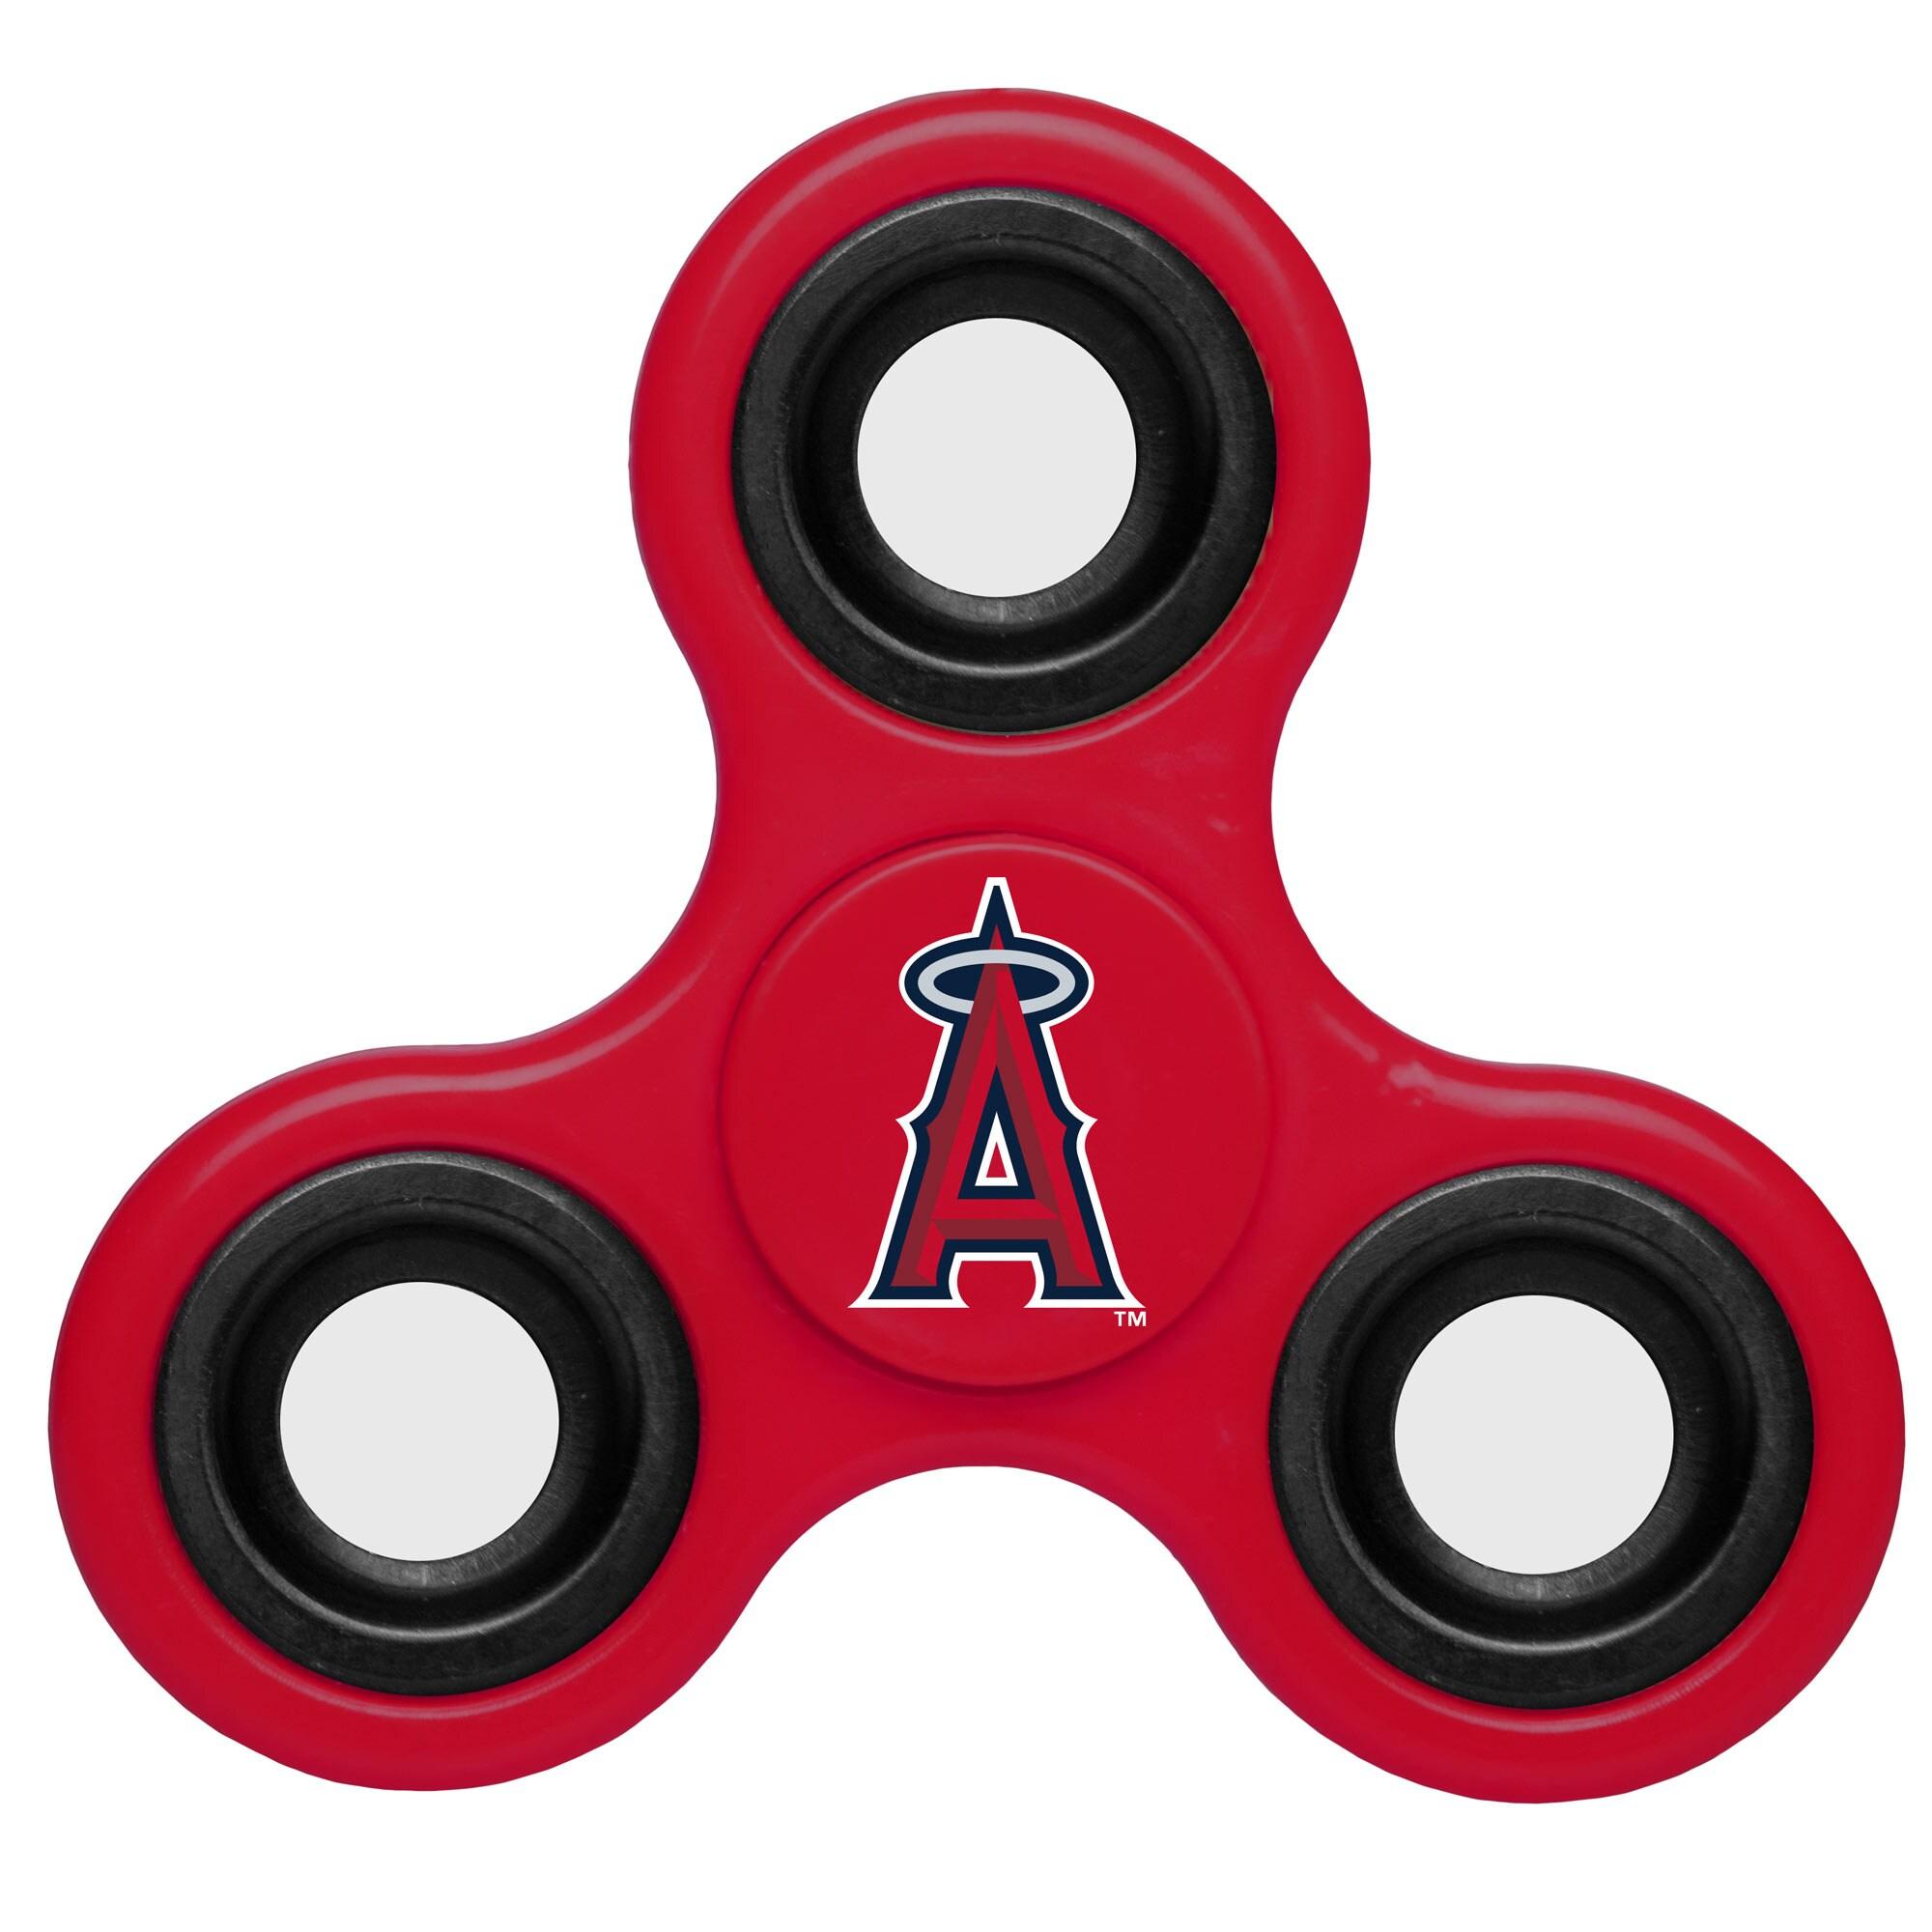 Los Angeles Angels 3-Way Fidget Spinner